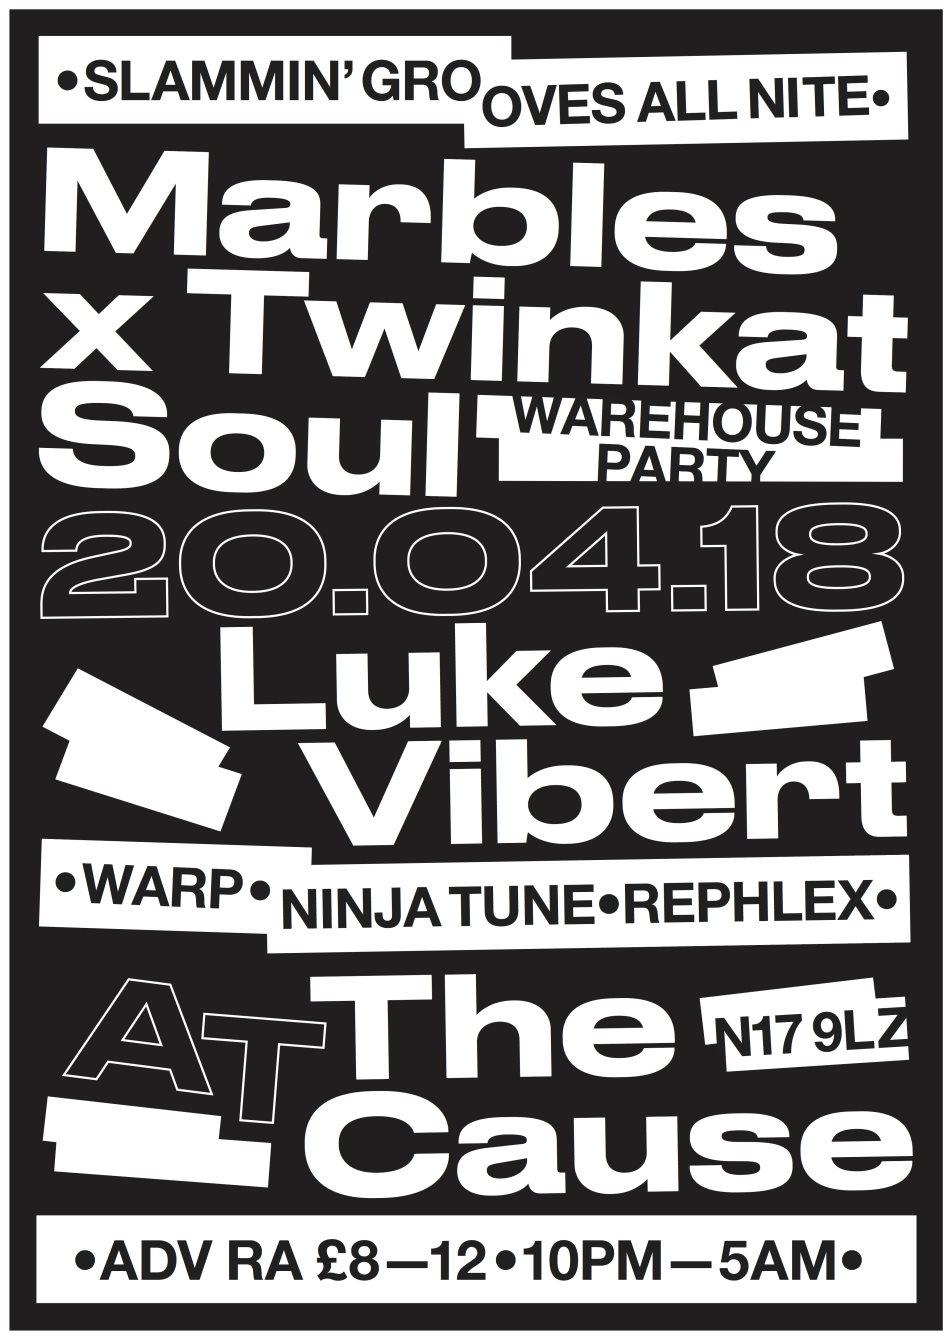 Luke Vibert at Marbles X Twinkat Soul Warehouse Party - Flyer front